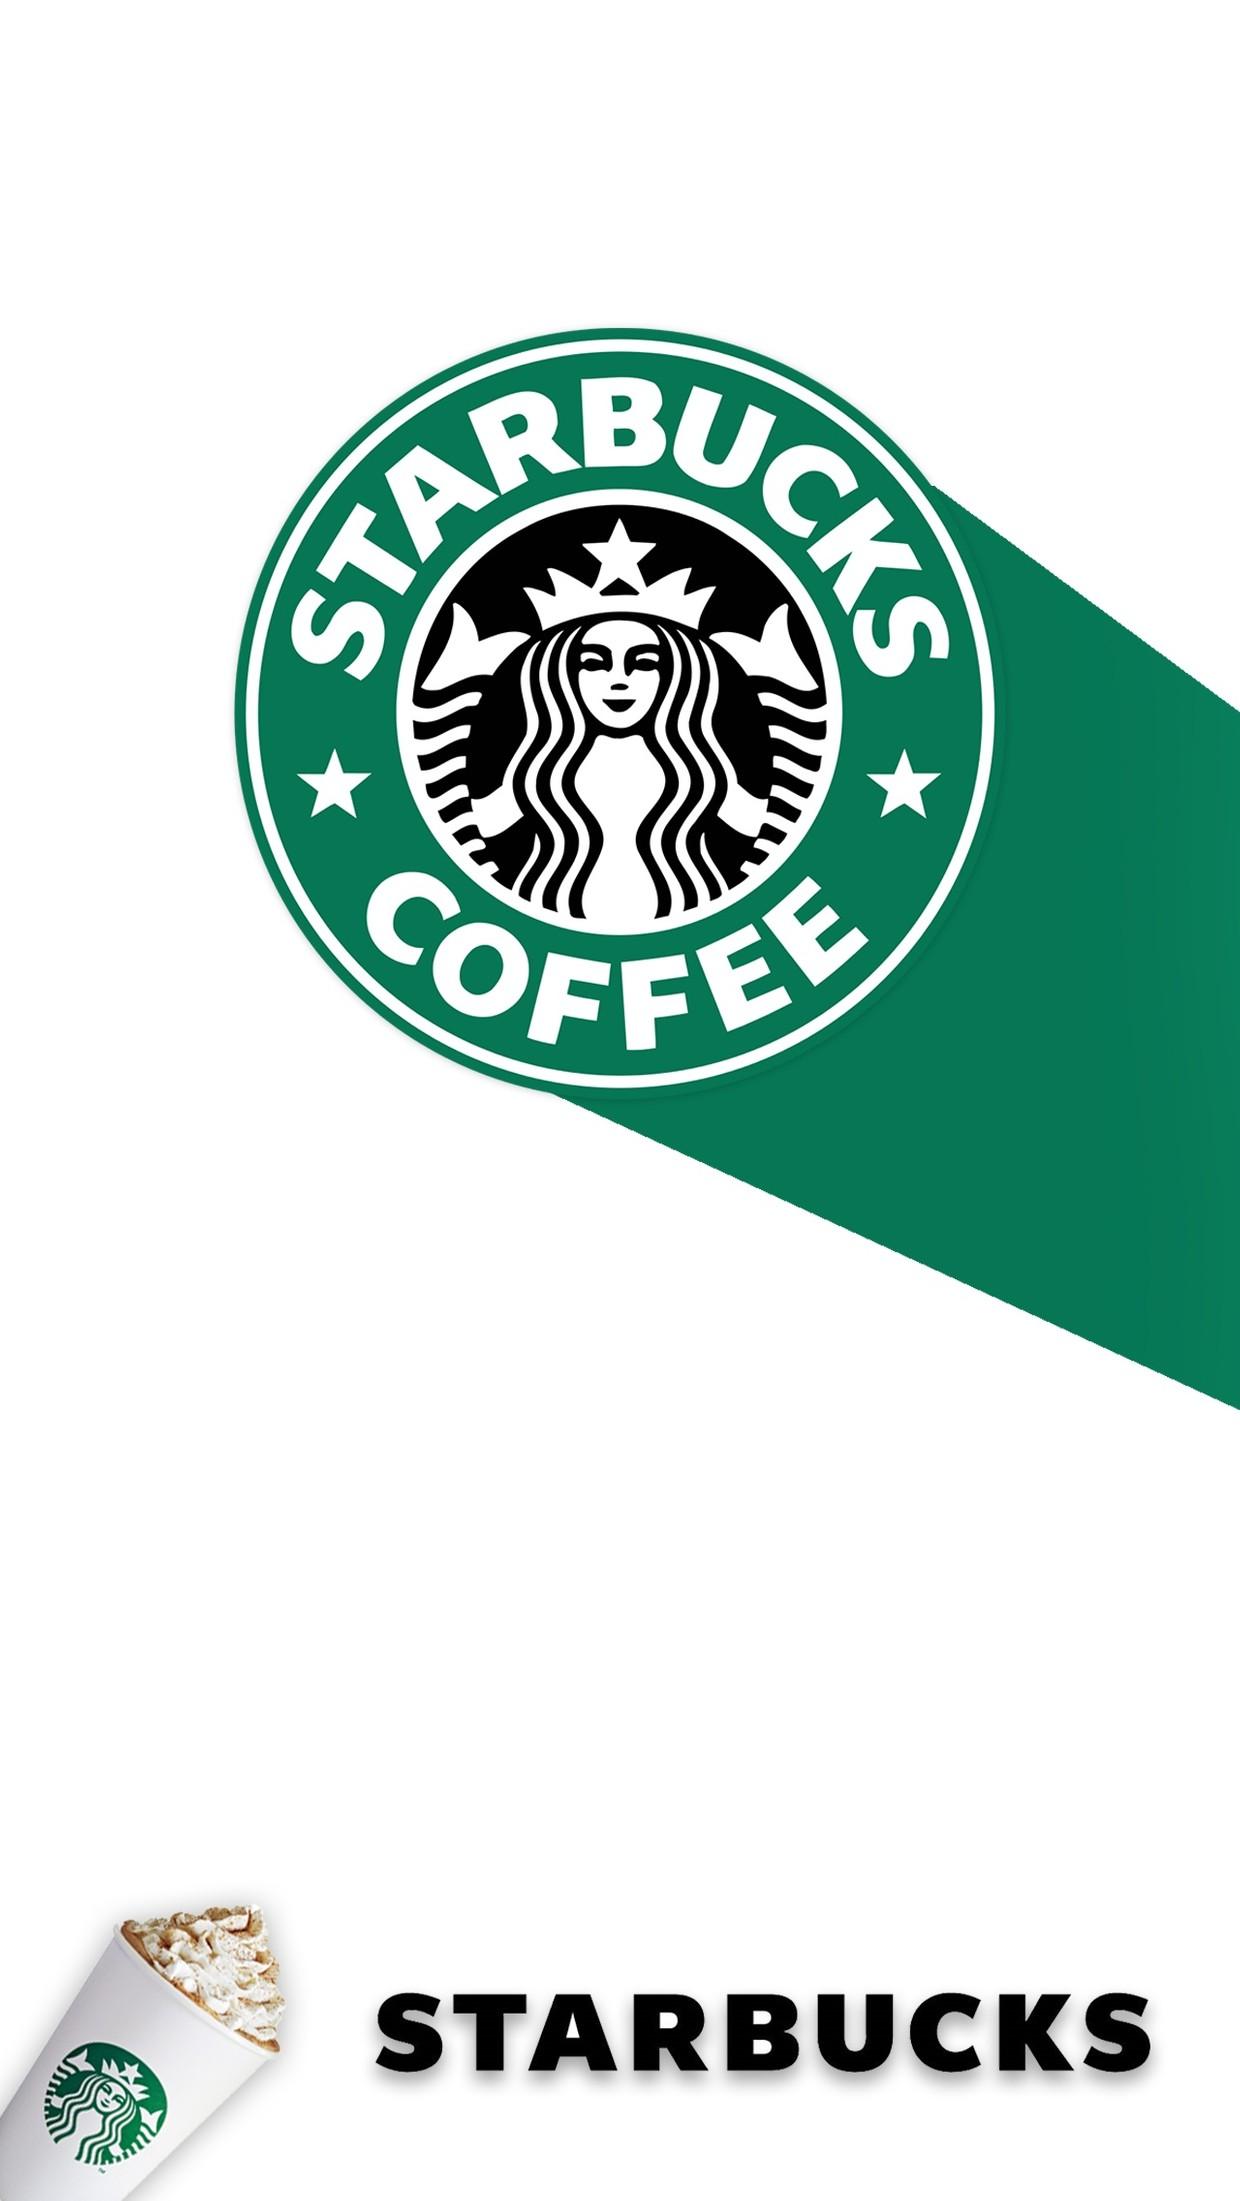 Starbucks Coffee Wallpaper Iphone 5 In Psd